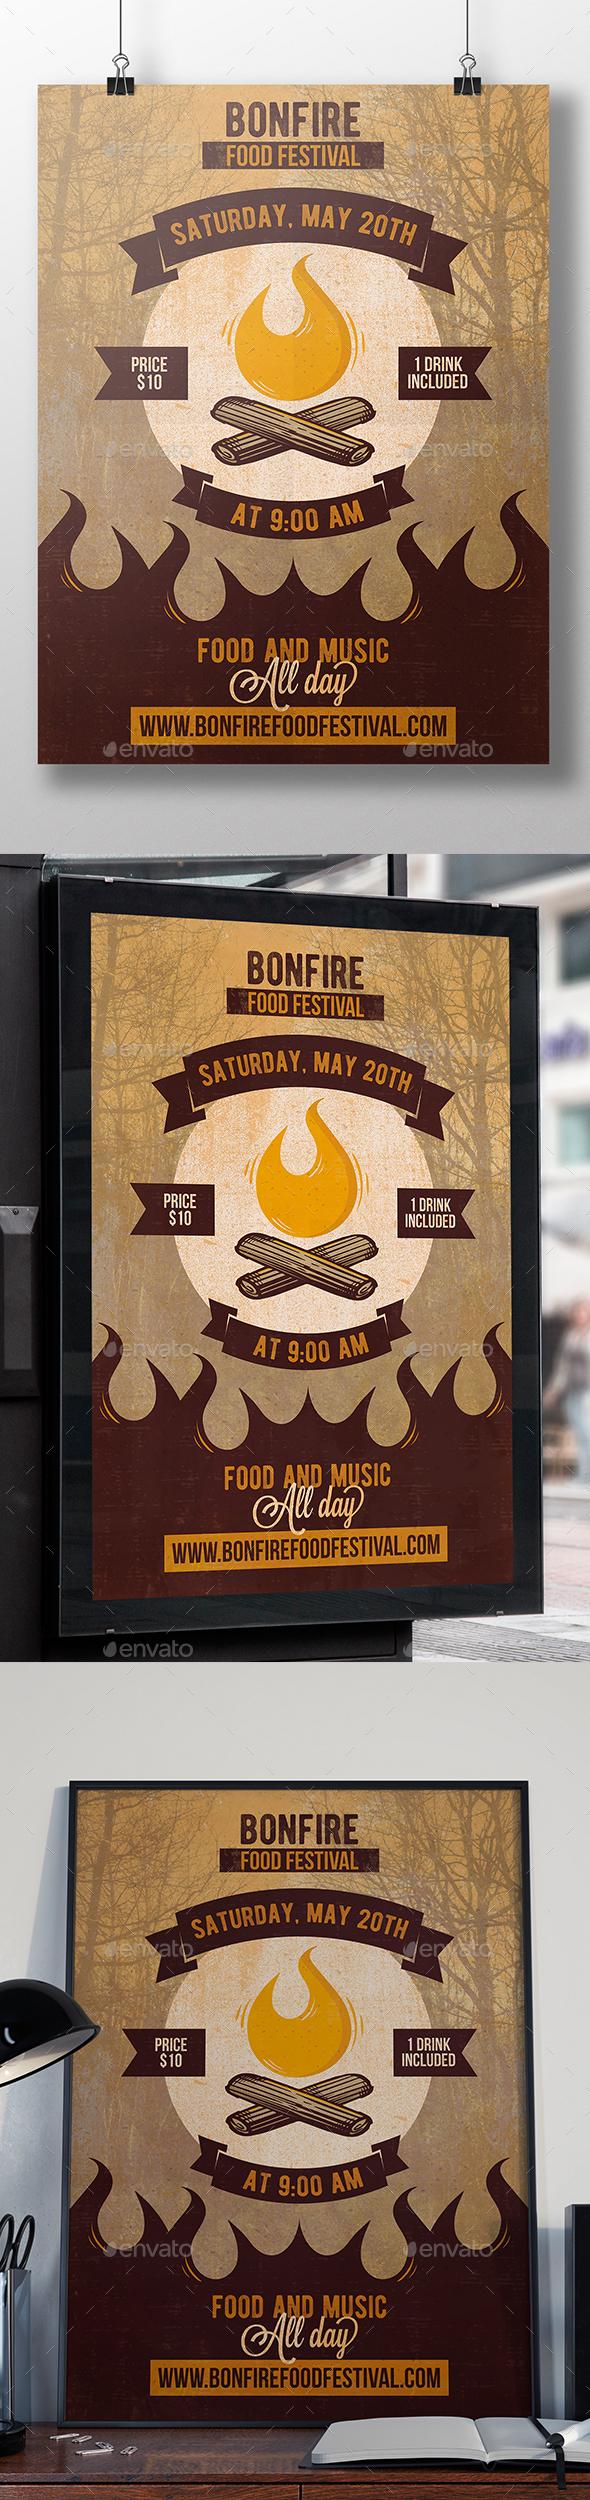 Bonfire Party Flyer Template - Events Flyers